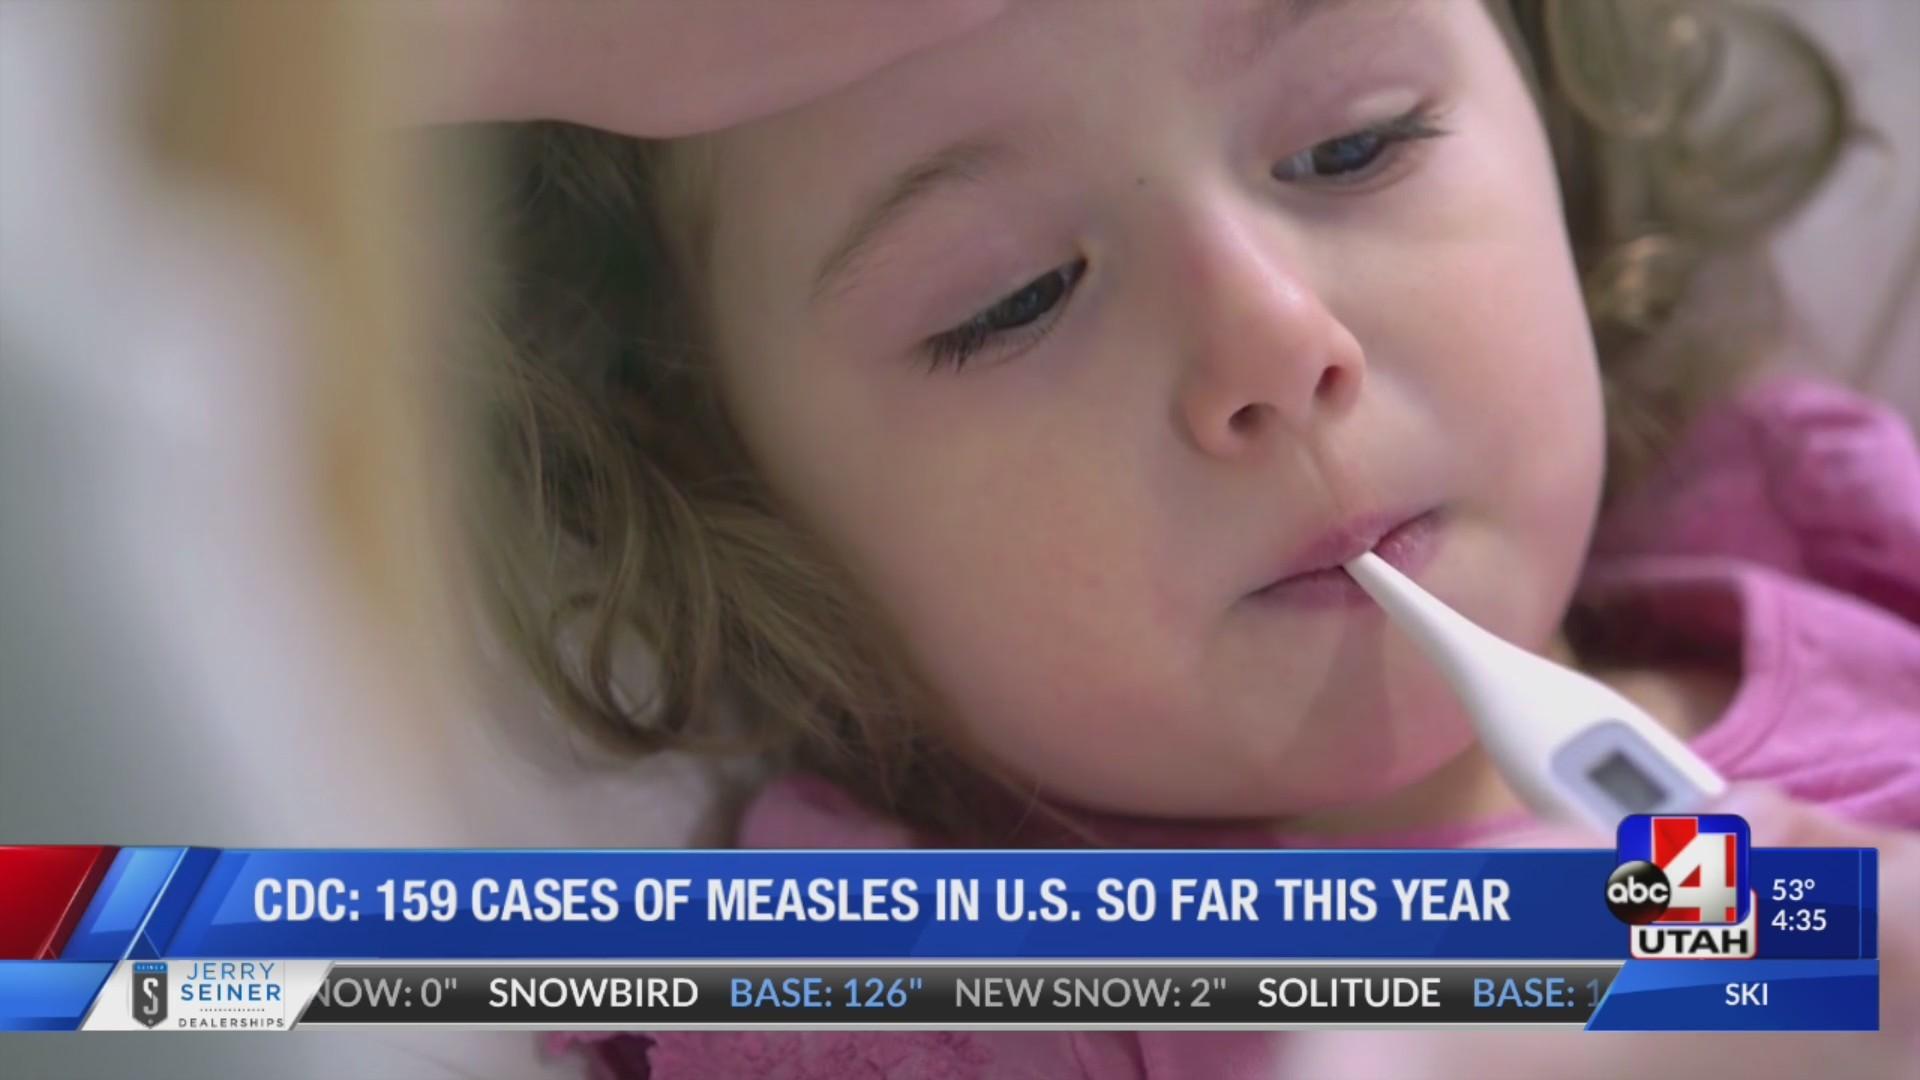 159 cases of measles in US in 2019